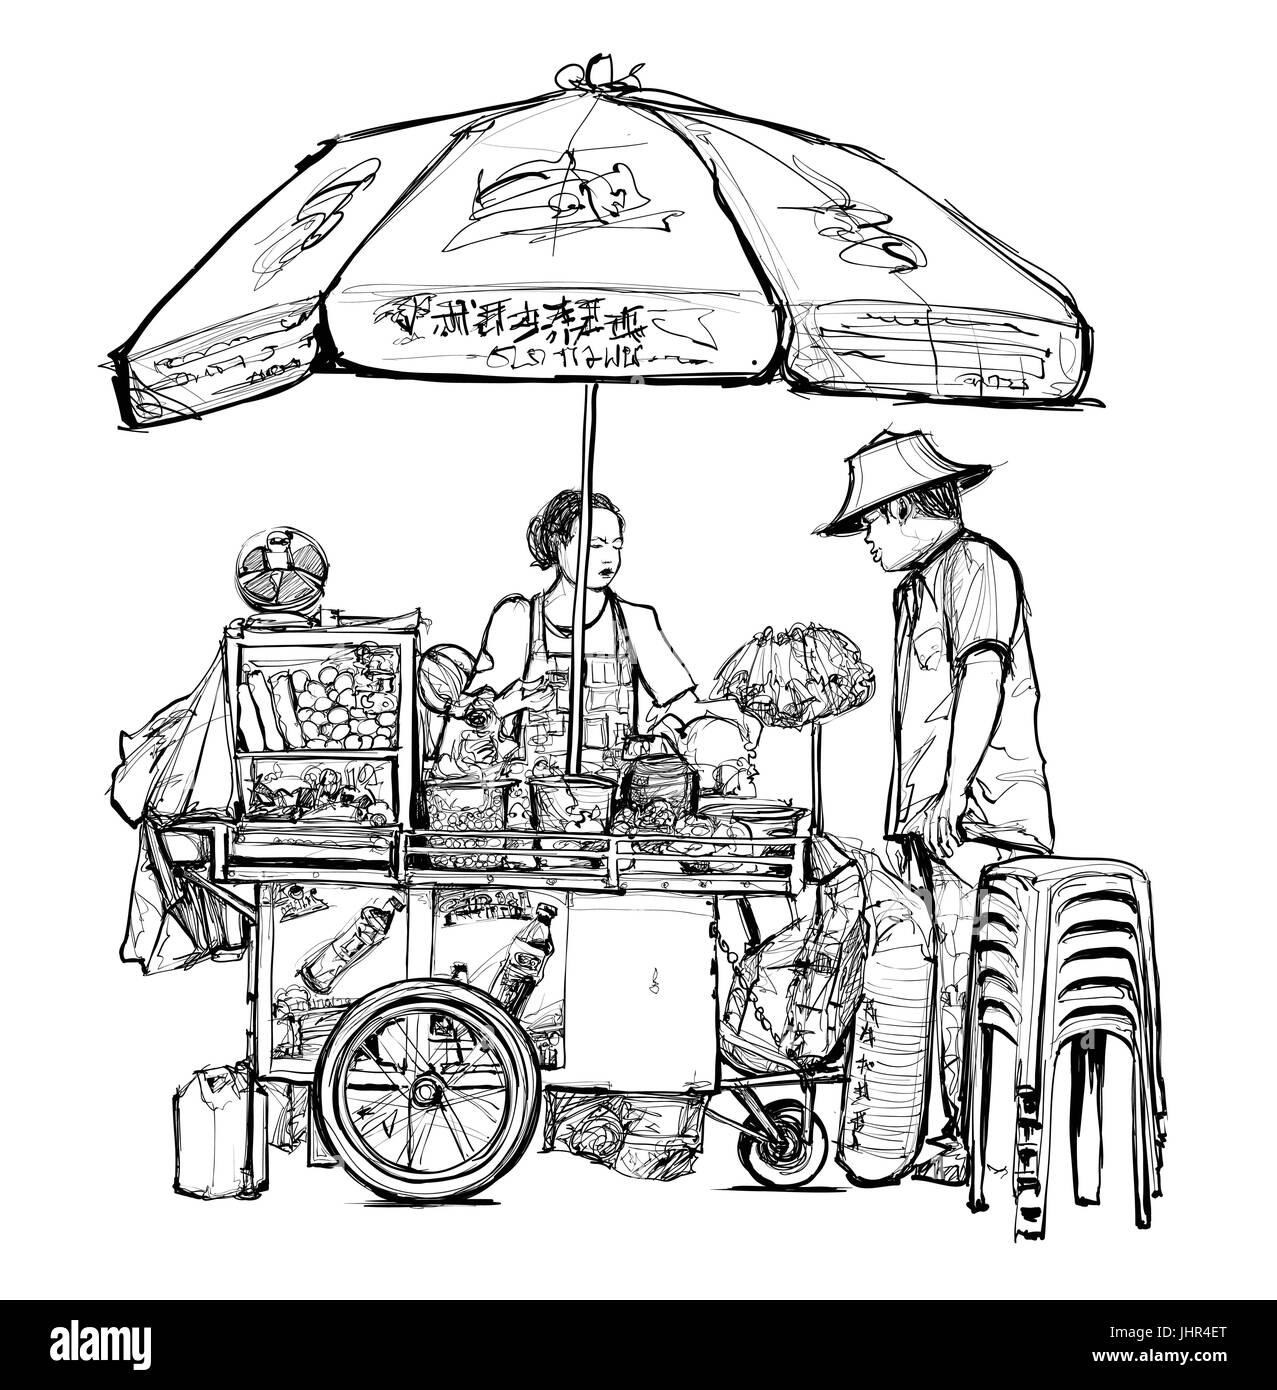 Street food seller in Bangkok (street, food, thailand) - vector illustration - Stock Image